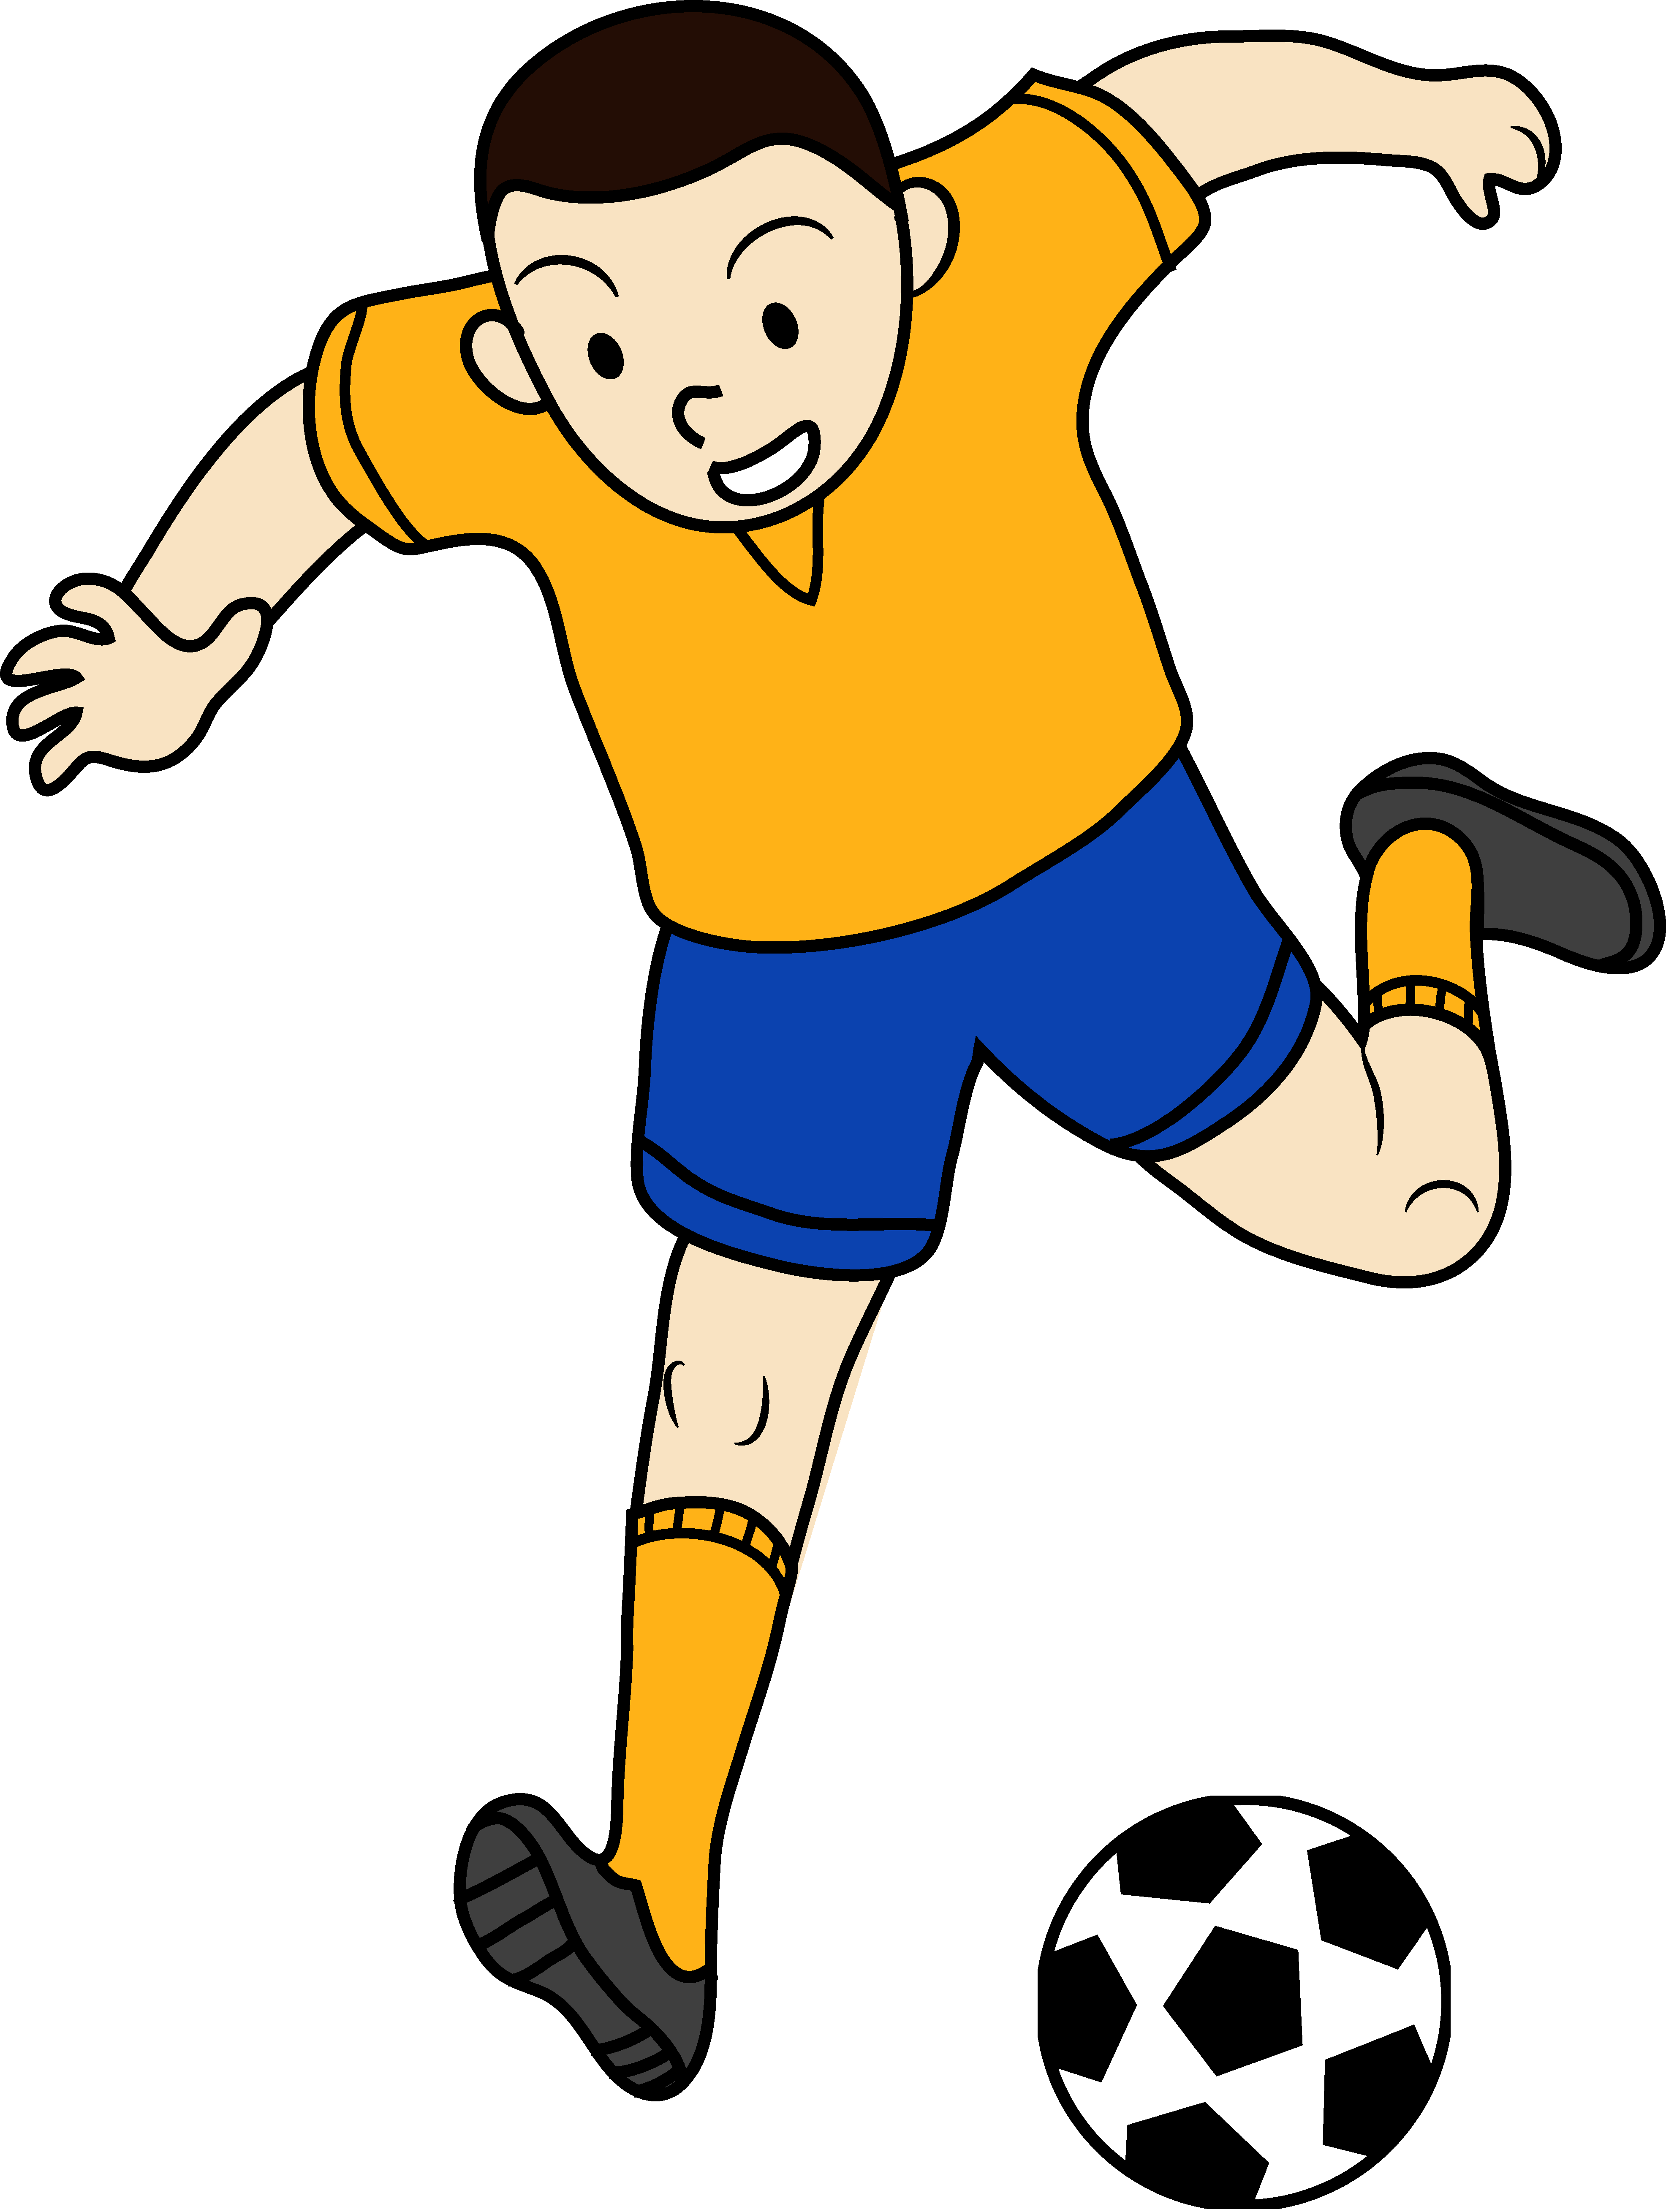 Kid Football Player Clipart-kid football player clipart-14